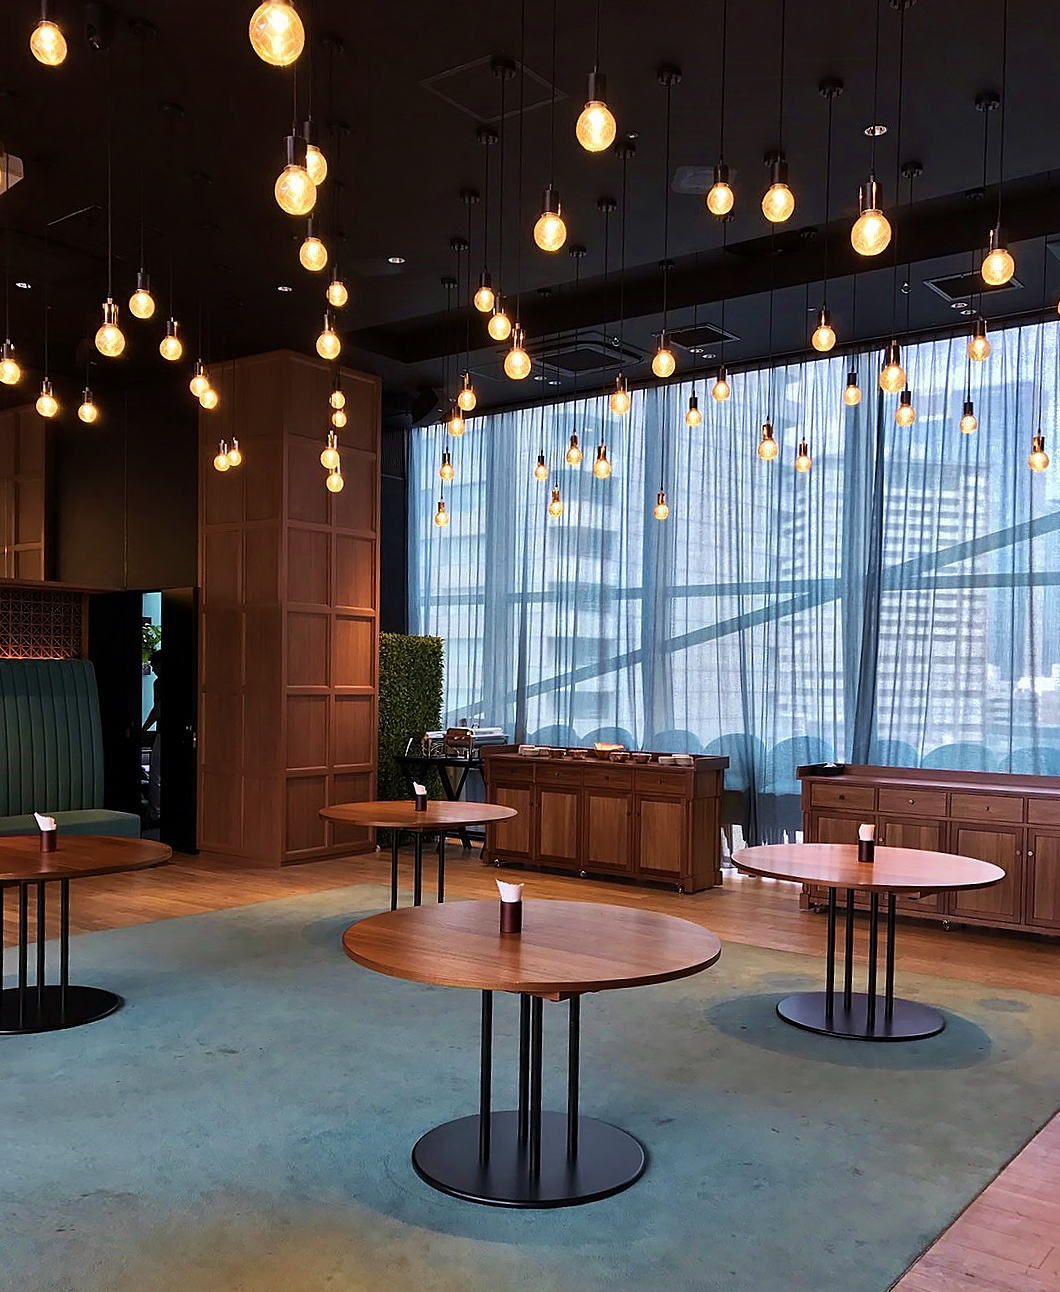 TOKYO Sparkling Fes 2017 オープニングイベント